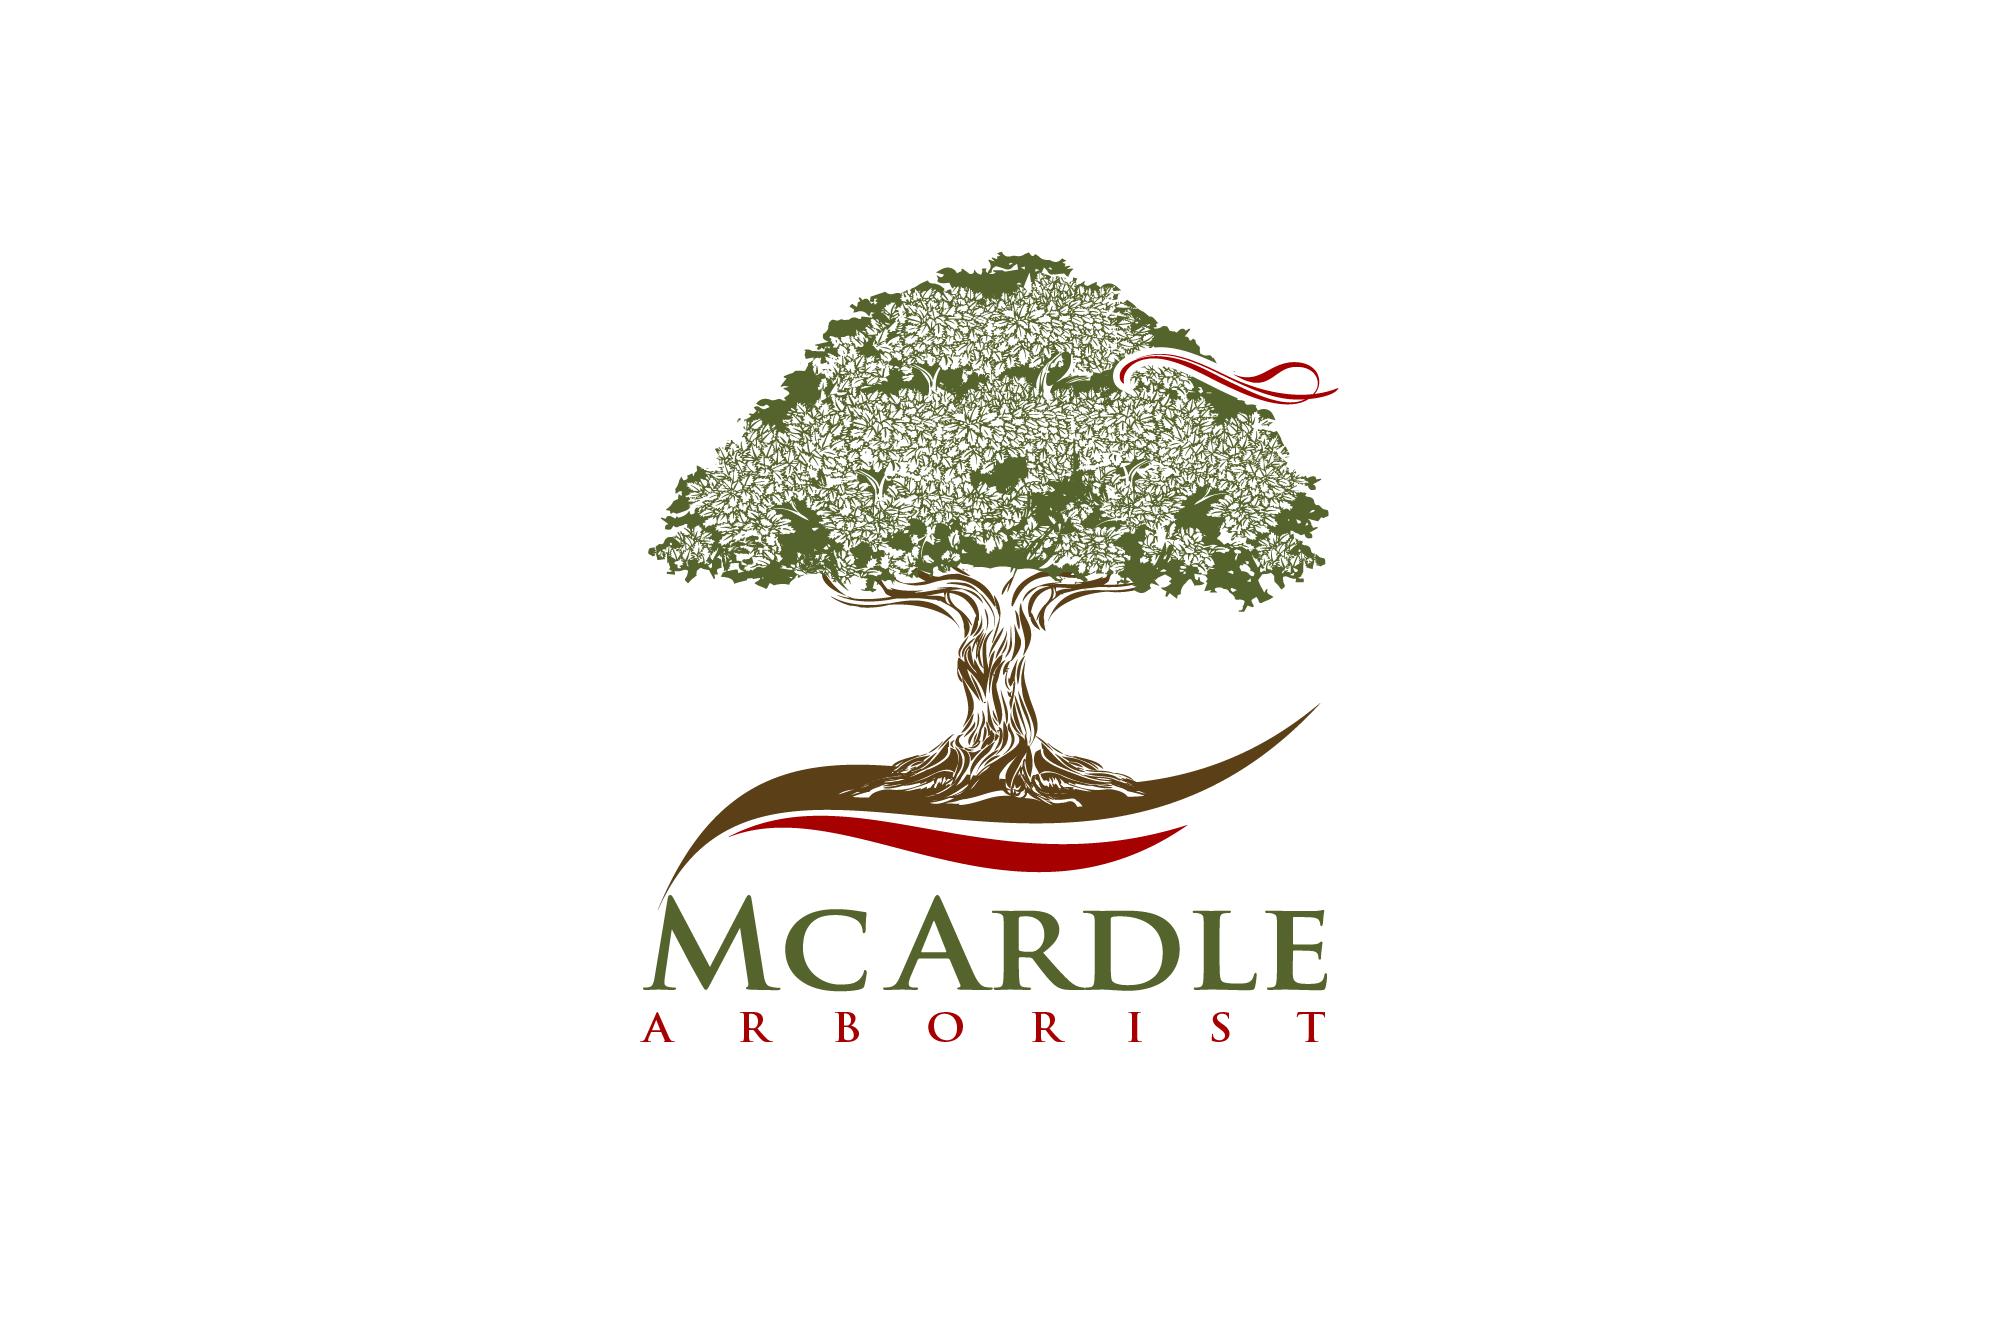 McArdle Arborist